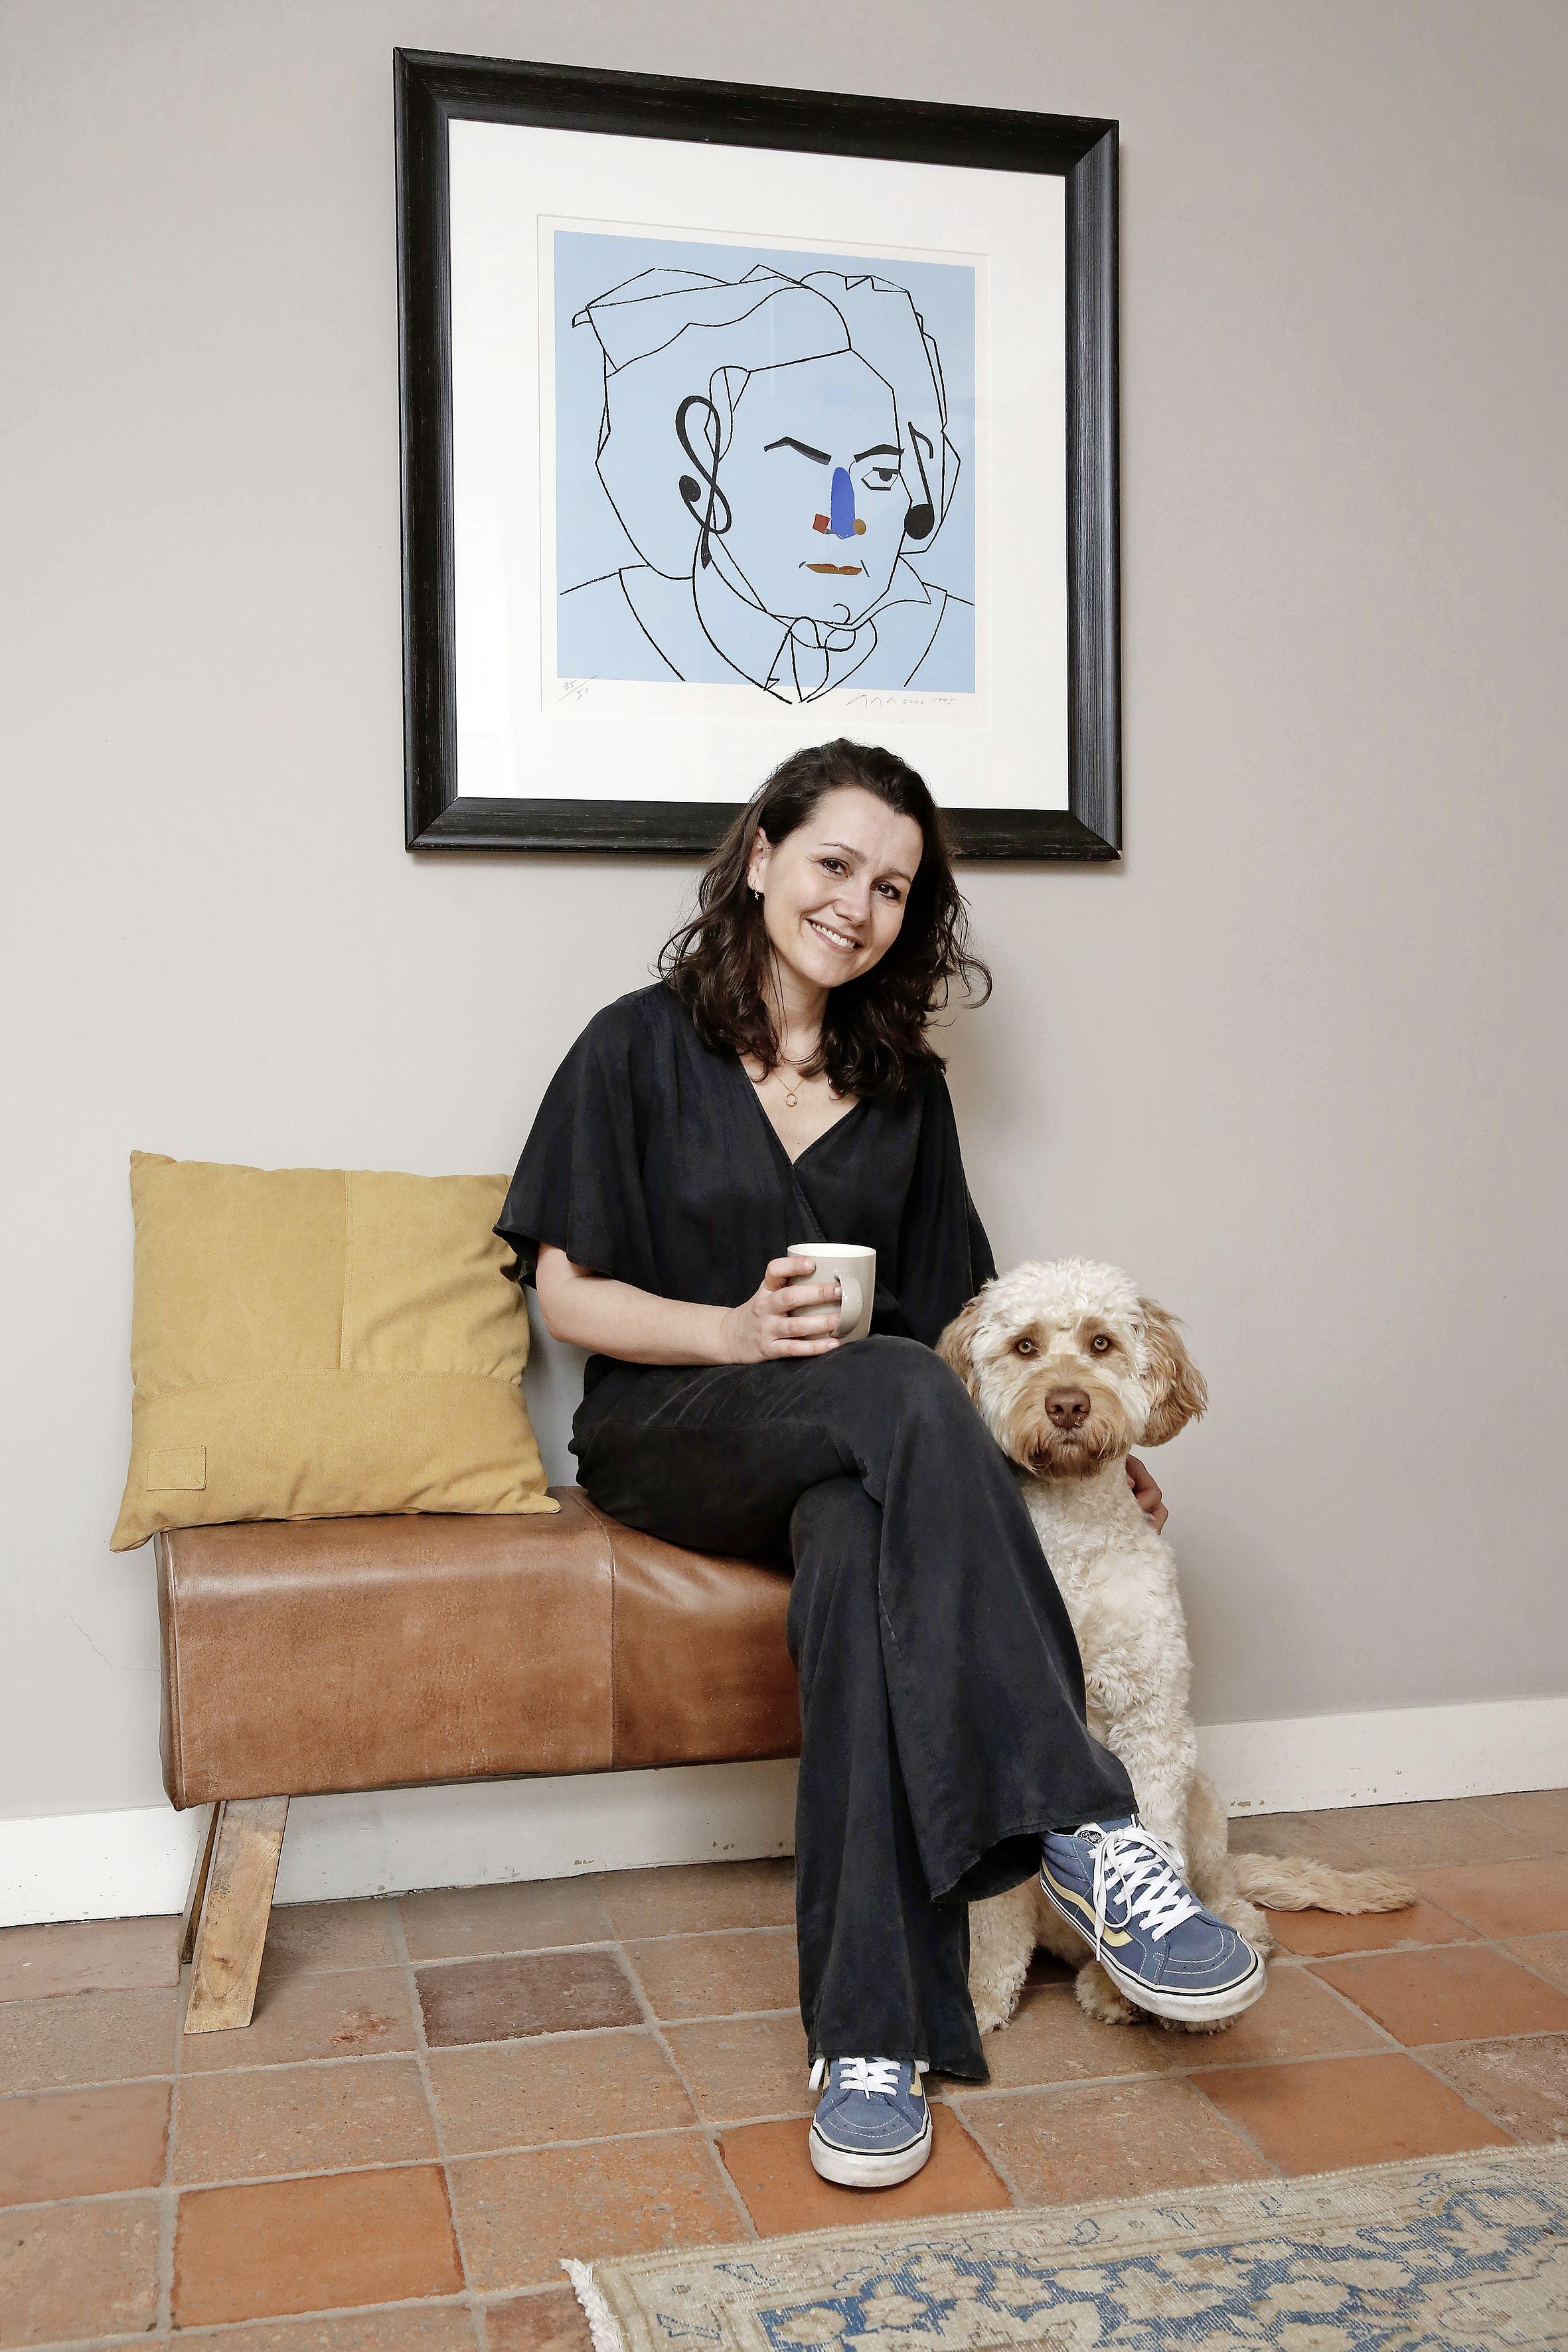 Inger Strietman leert ons over gezond egoïsme